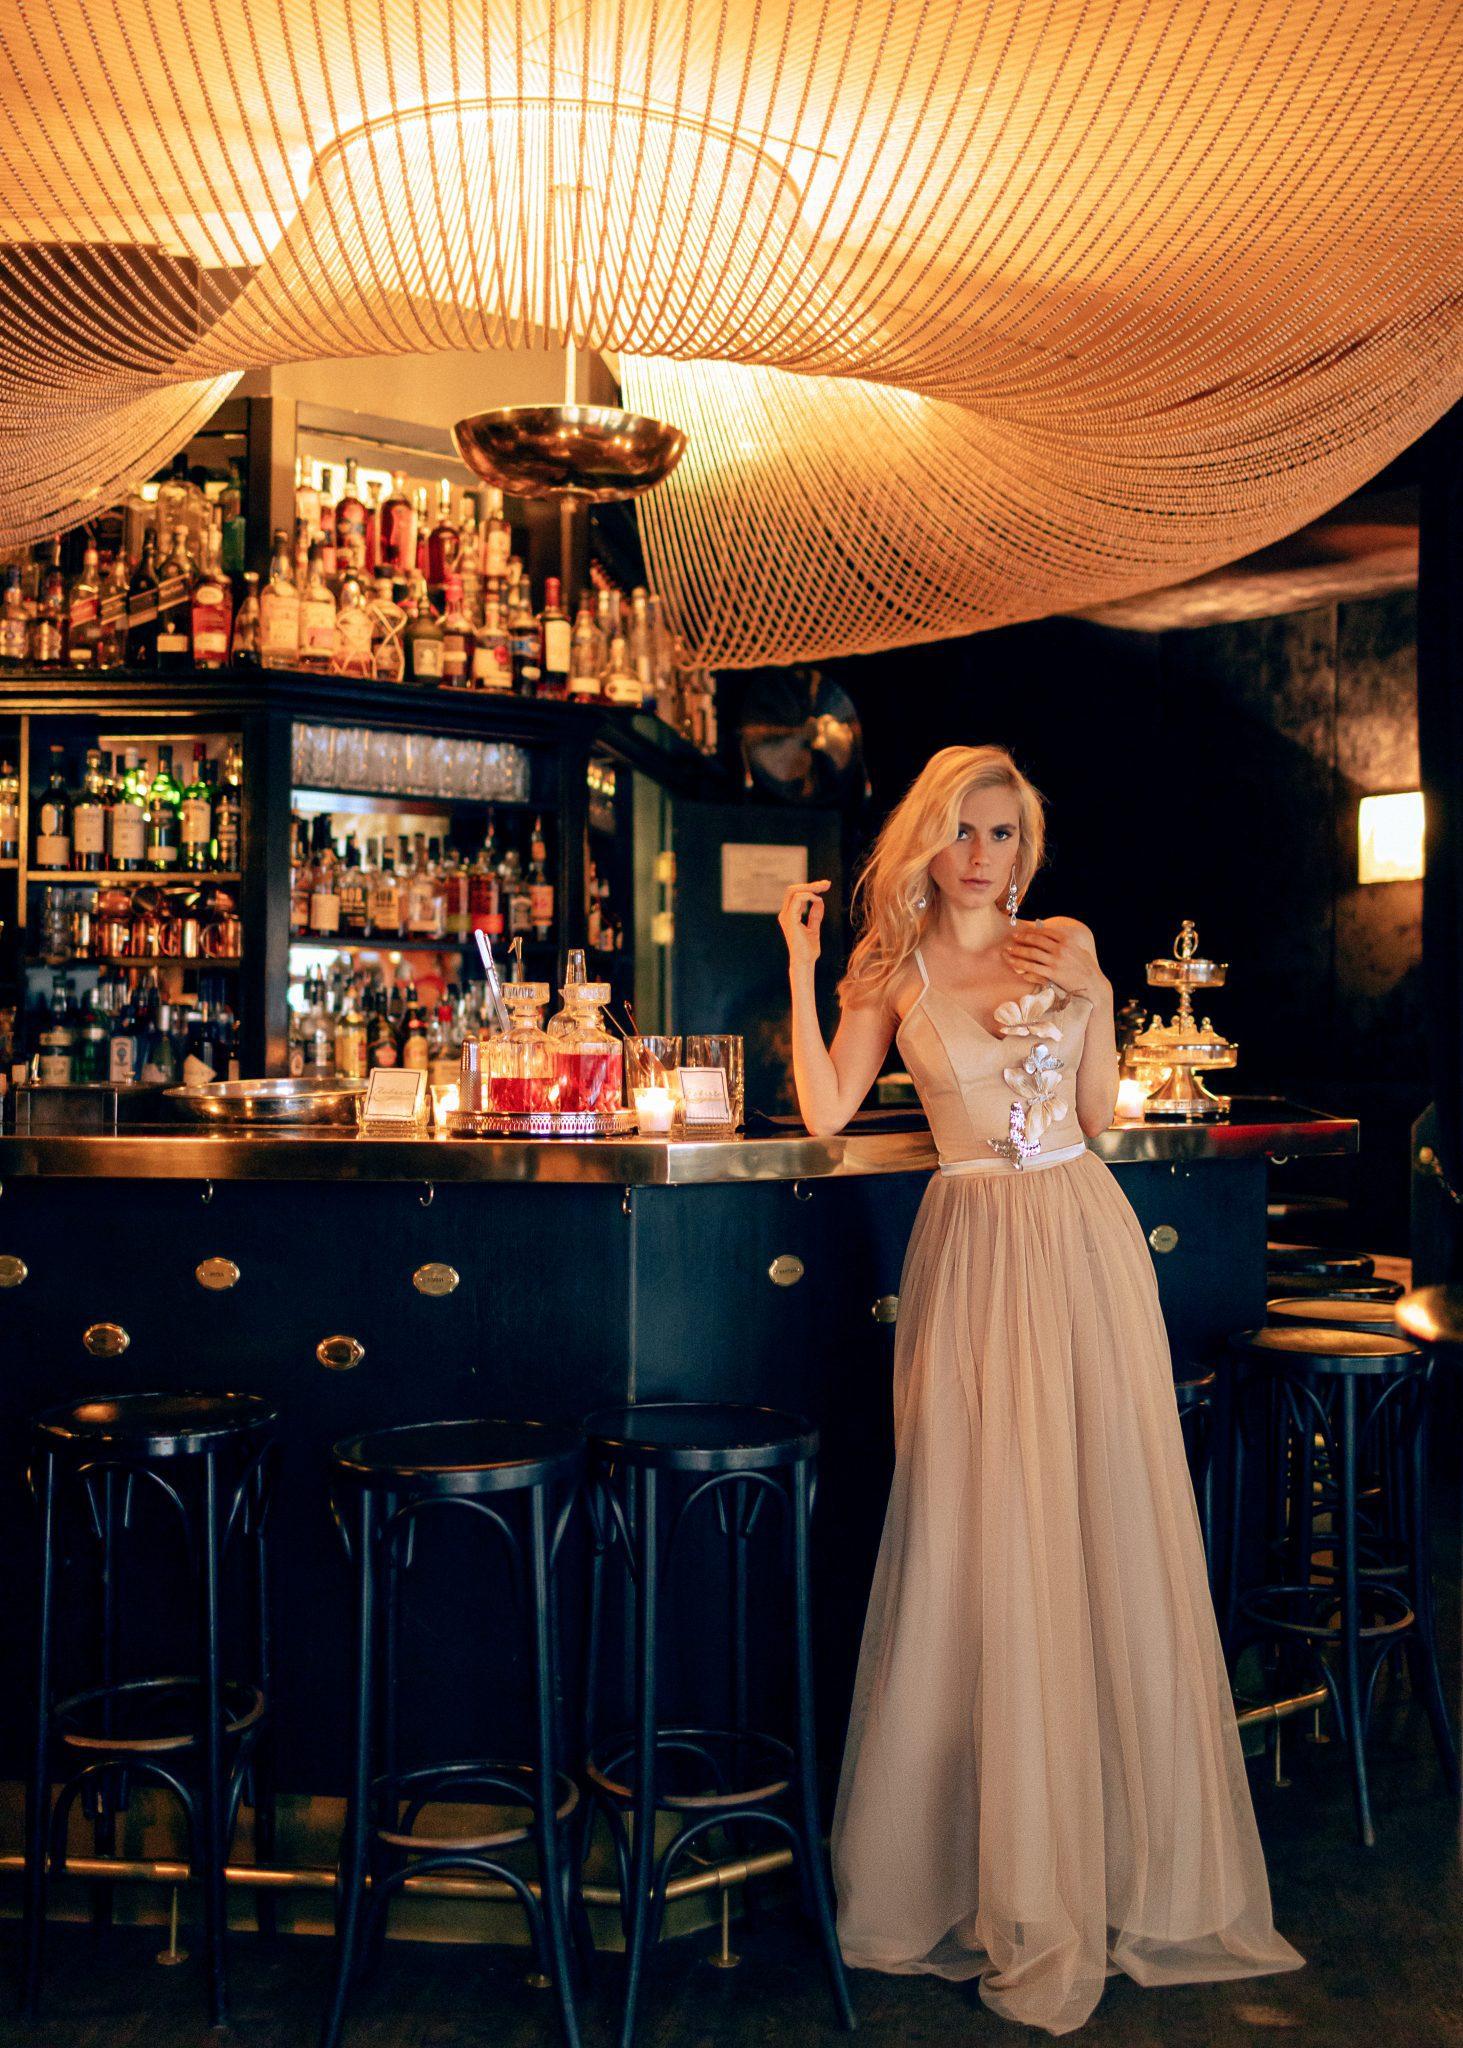 Chillin @Robertos American Bar